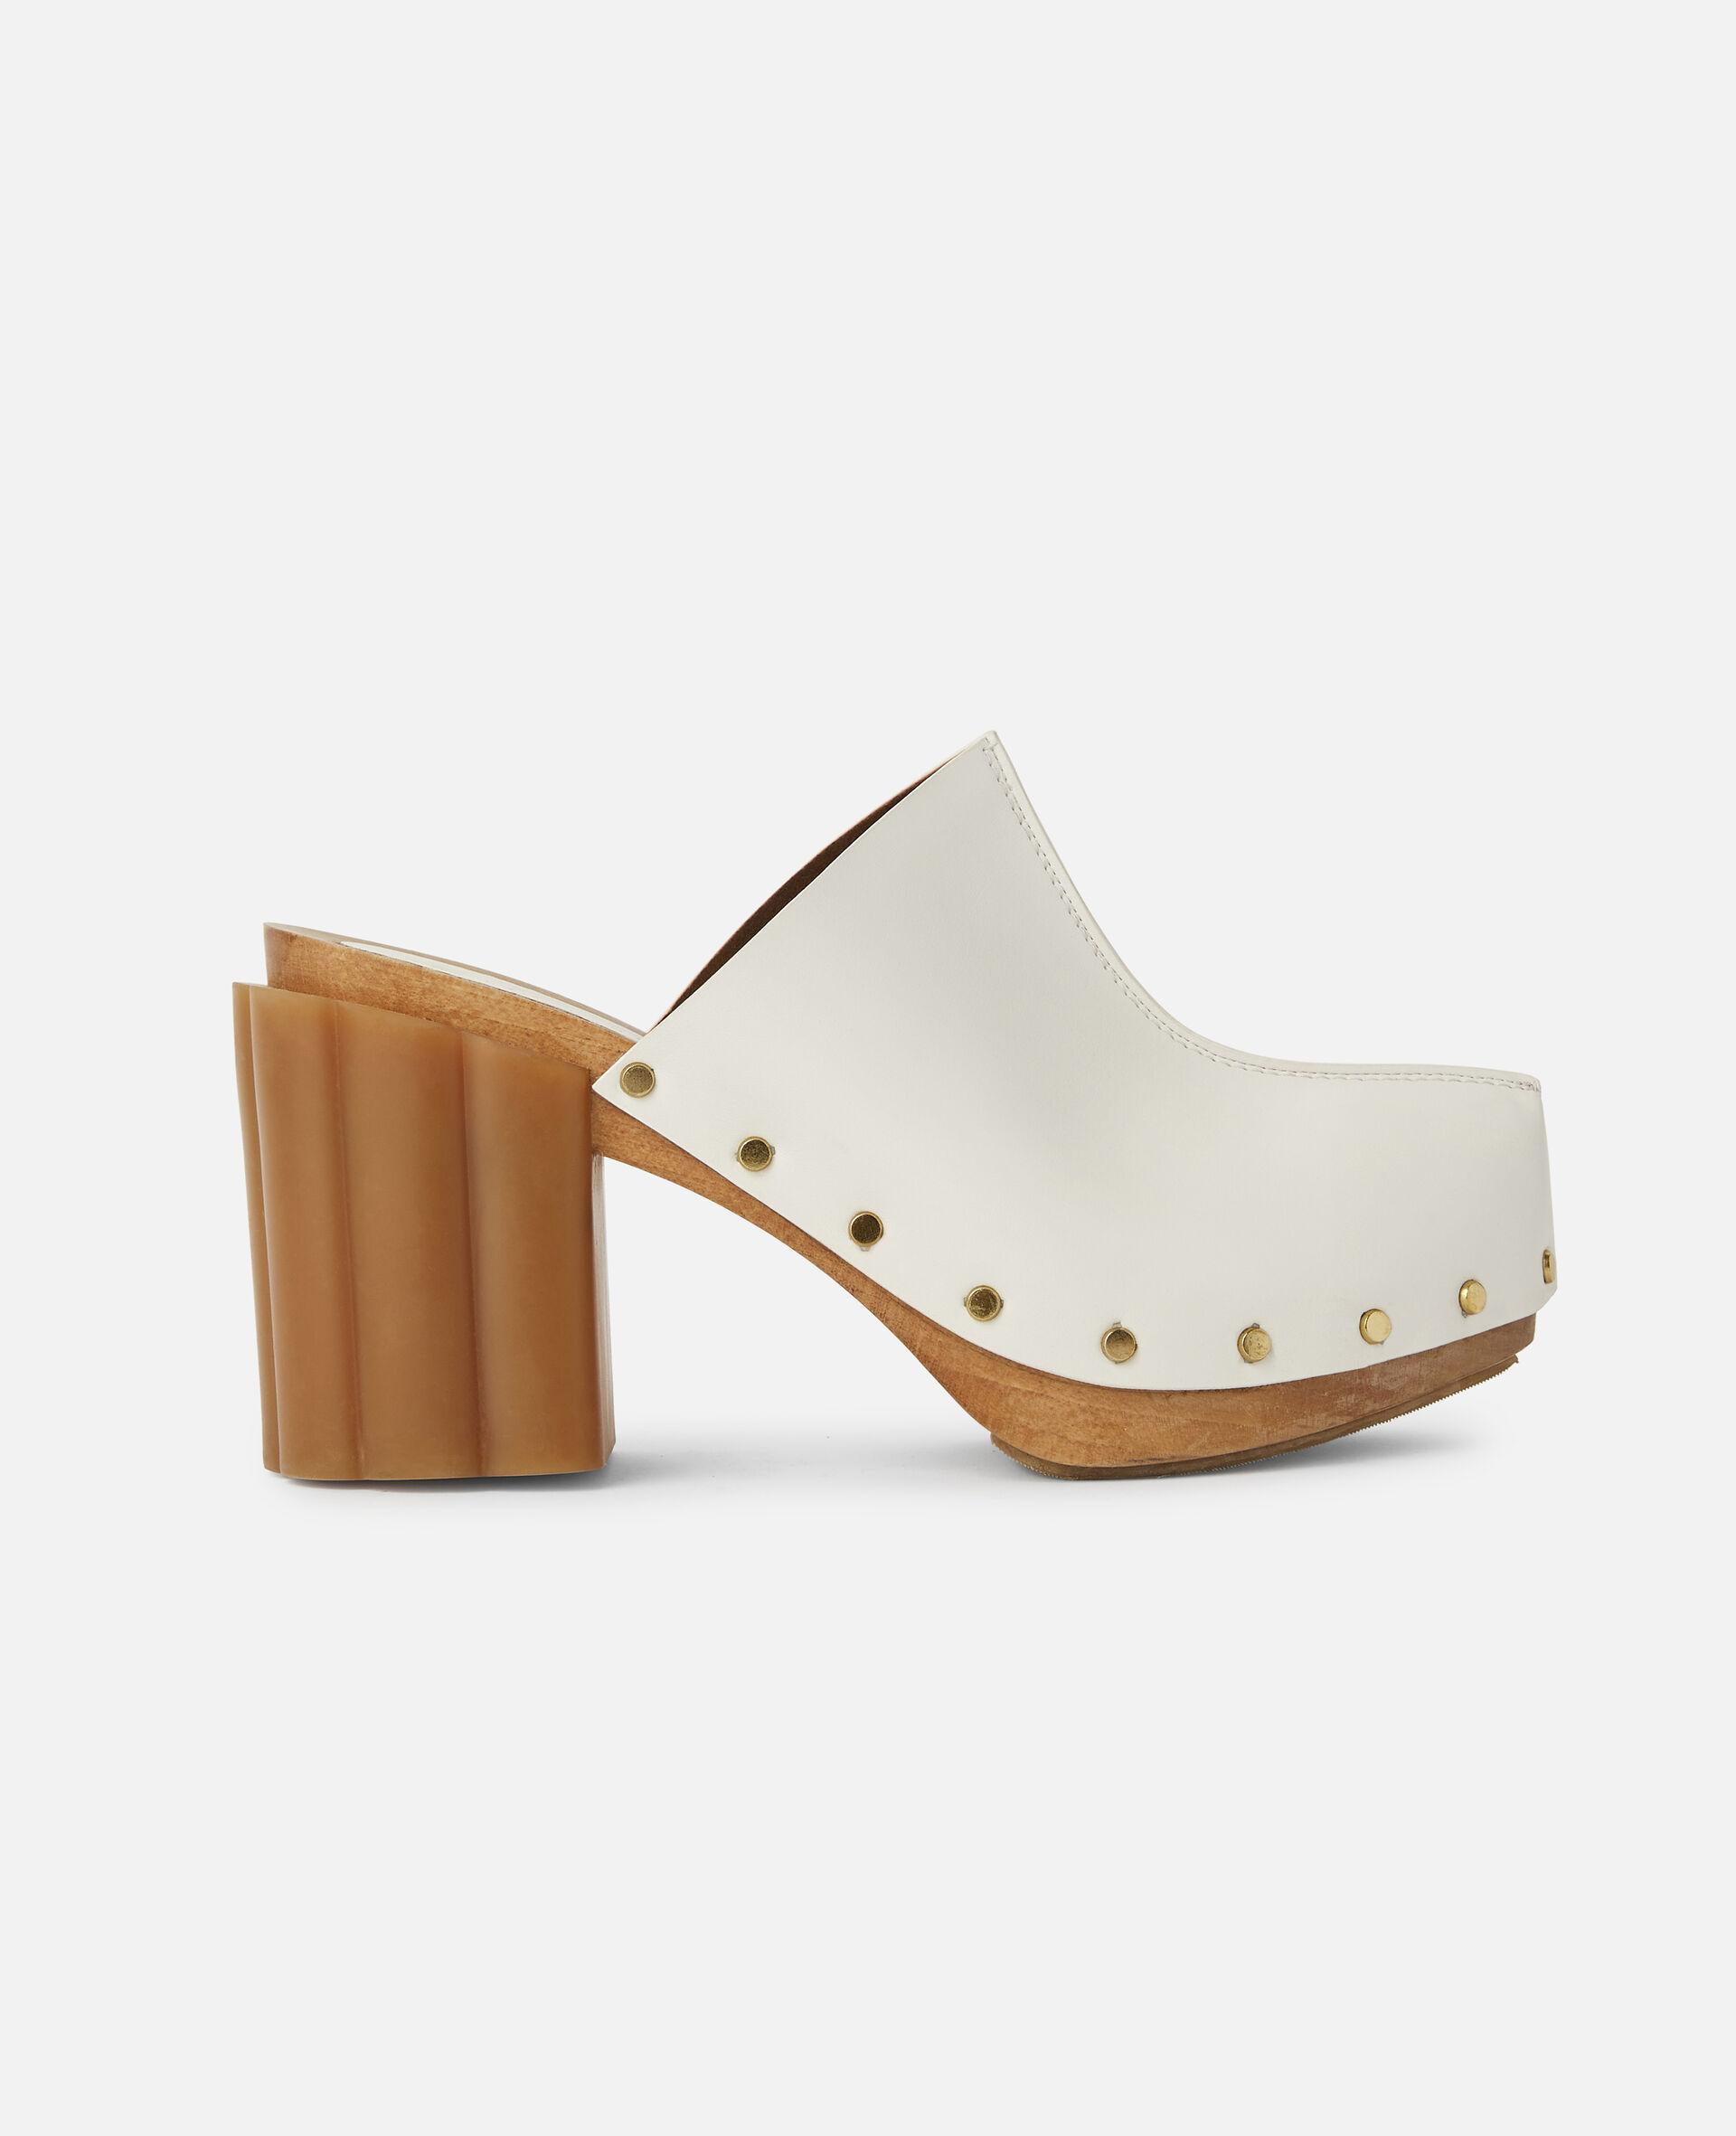 Sandales Daisy cloutées-Blanc-large image number 0